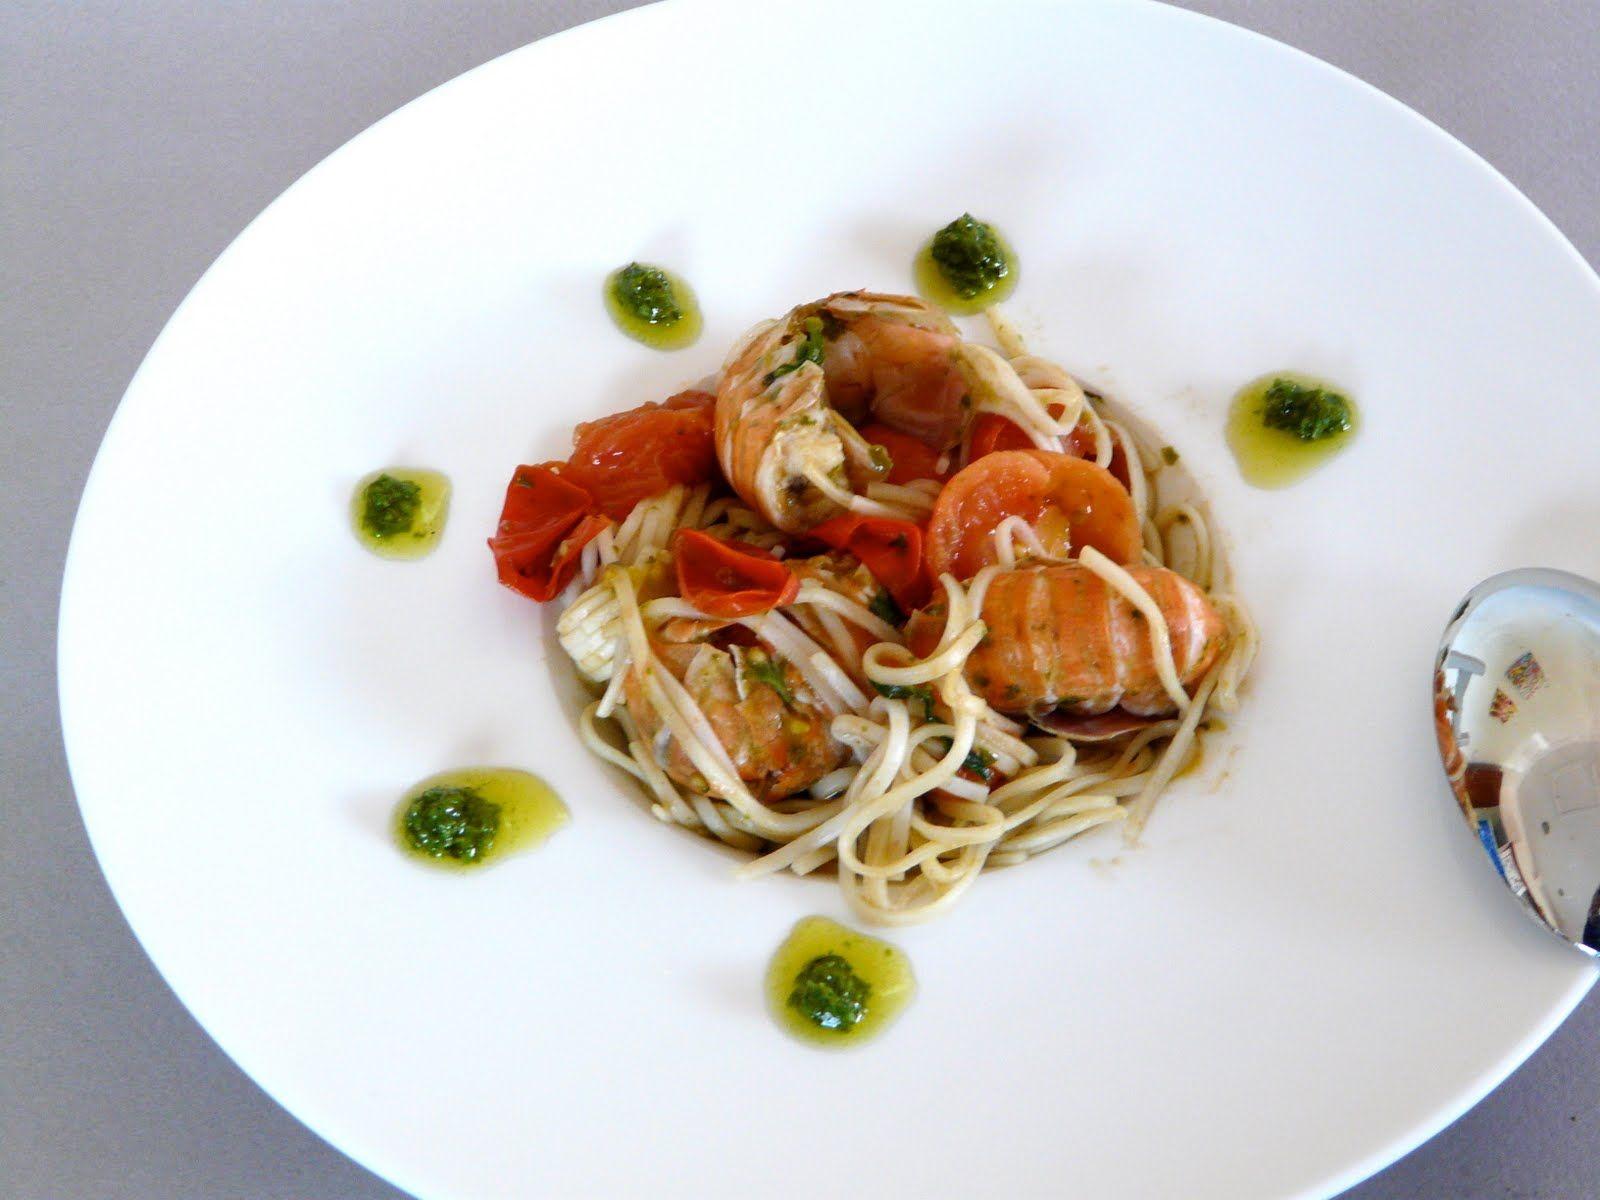 recette rapide pour le soir spaghetti pesto plat rapide et facile recette simple et facile. Black Bedroom Furniture Sets. Home Design Ideas